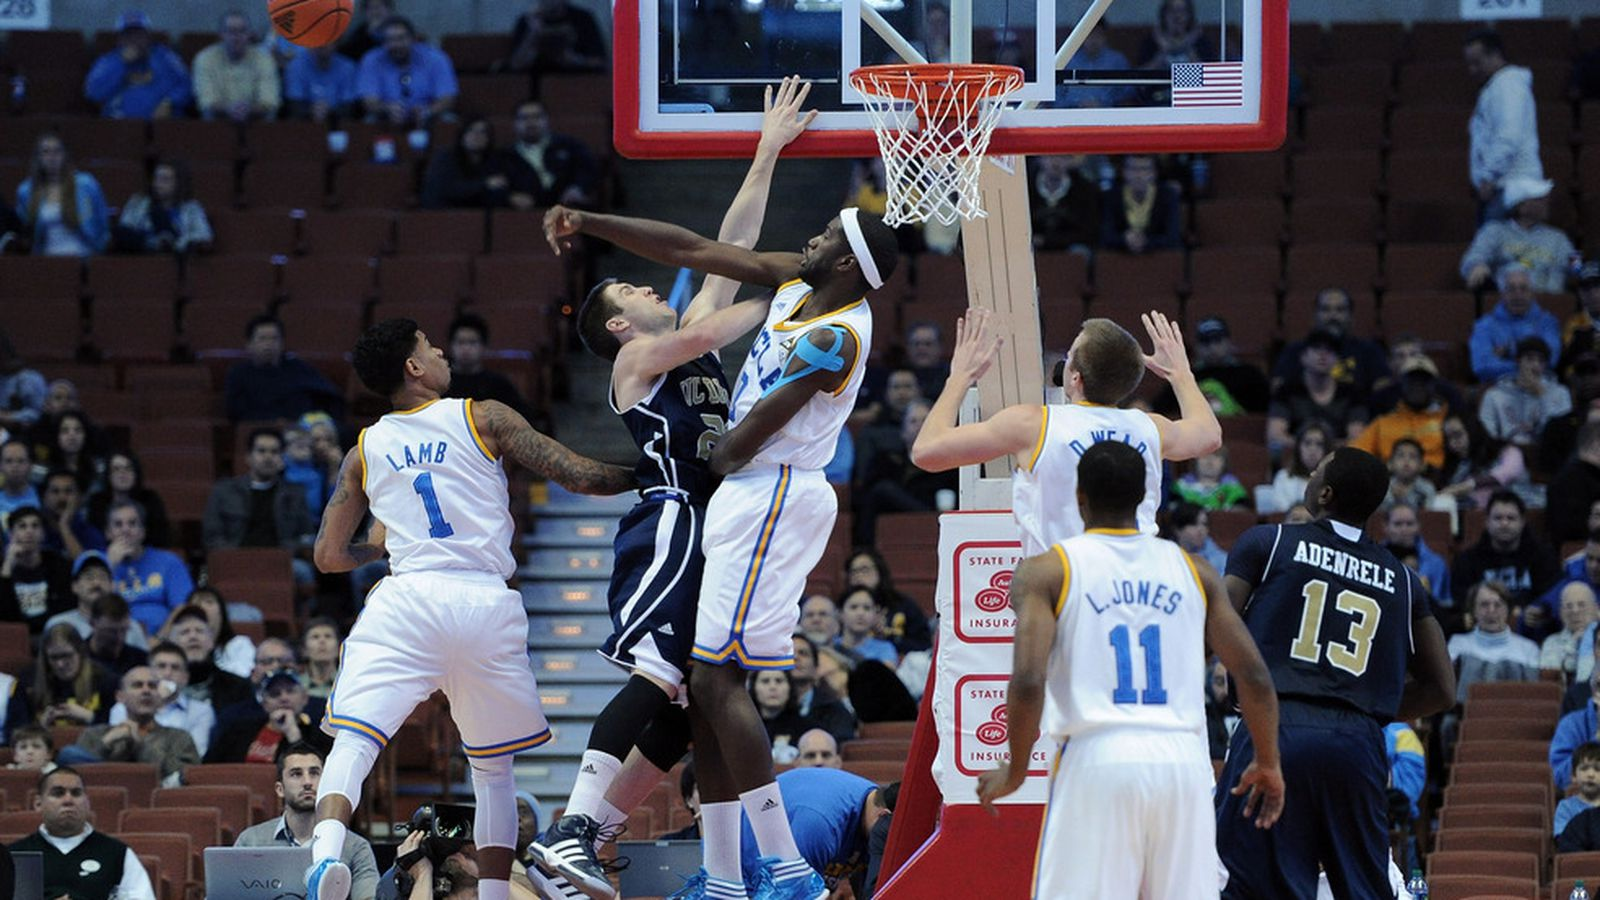 Get a summary of the UC Santa Barbara Gauchos vs UC Irvine Anteaters basketball game